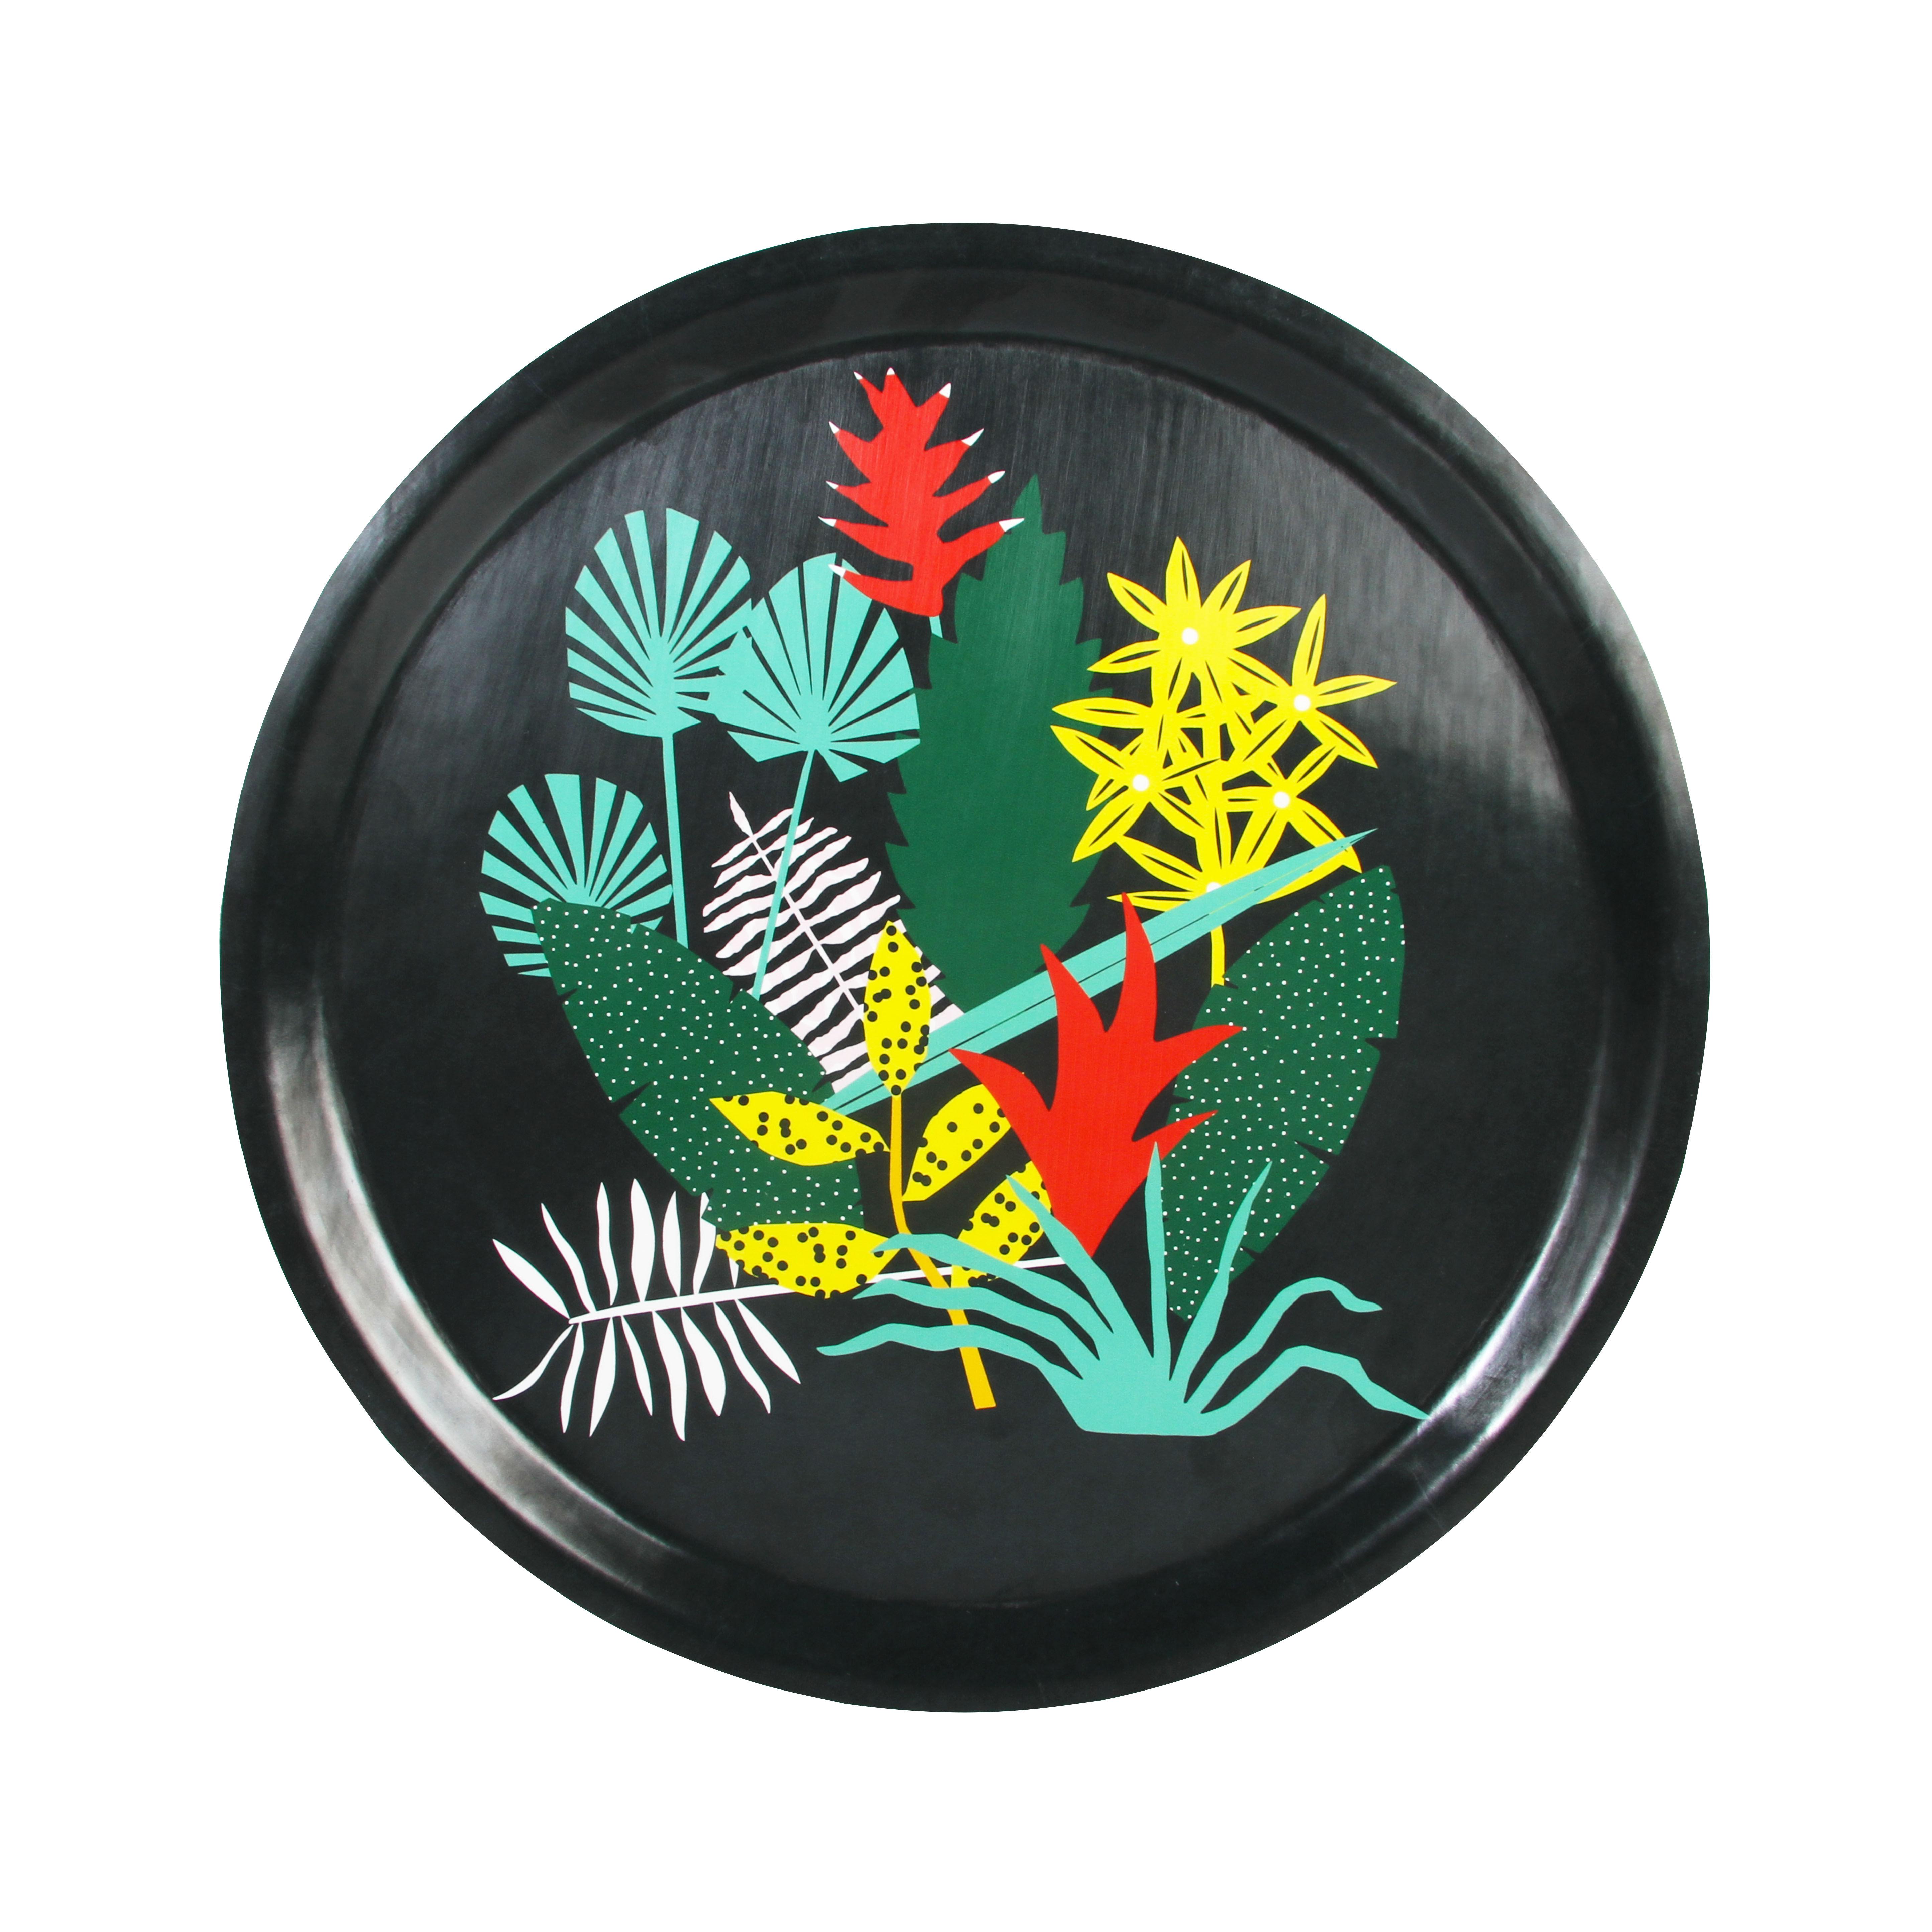 Tischkultur - Tabletts - Botanic Tablett / Melamin - Ø 31 cm - & klevering - Mehrfarbige Blumenmotive auf schwarzem Grund - Furnier, Melamin